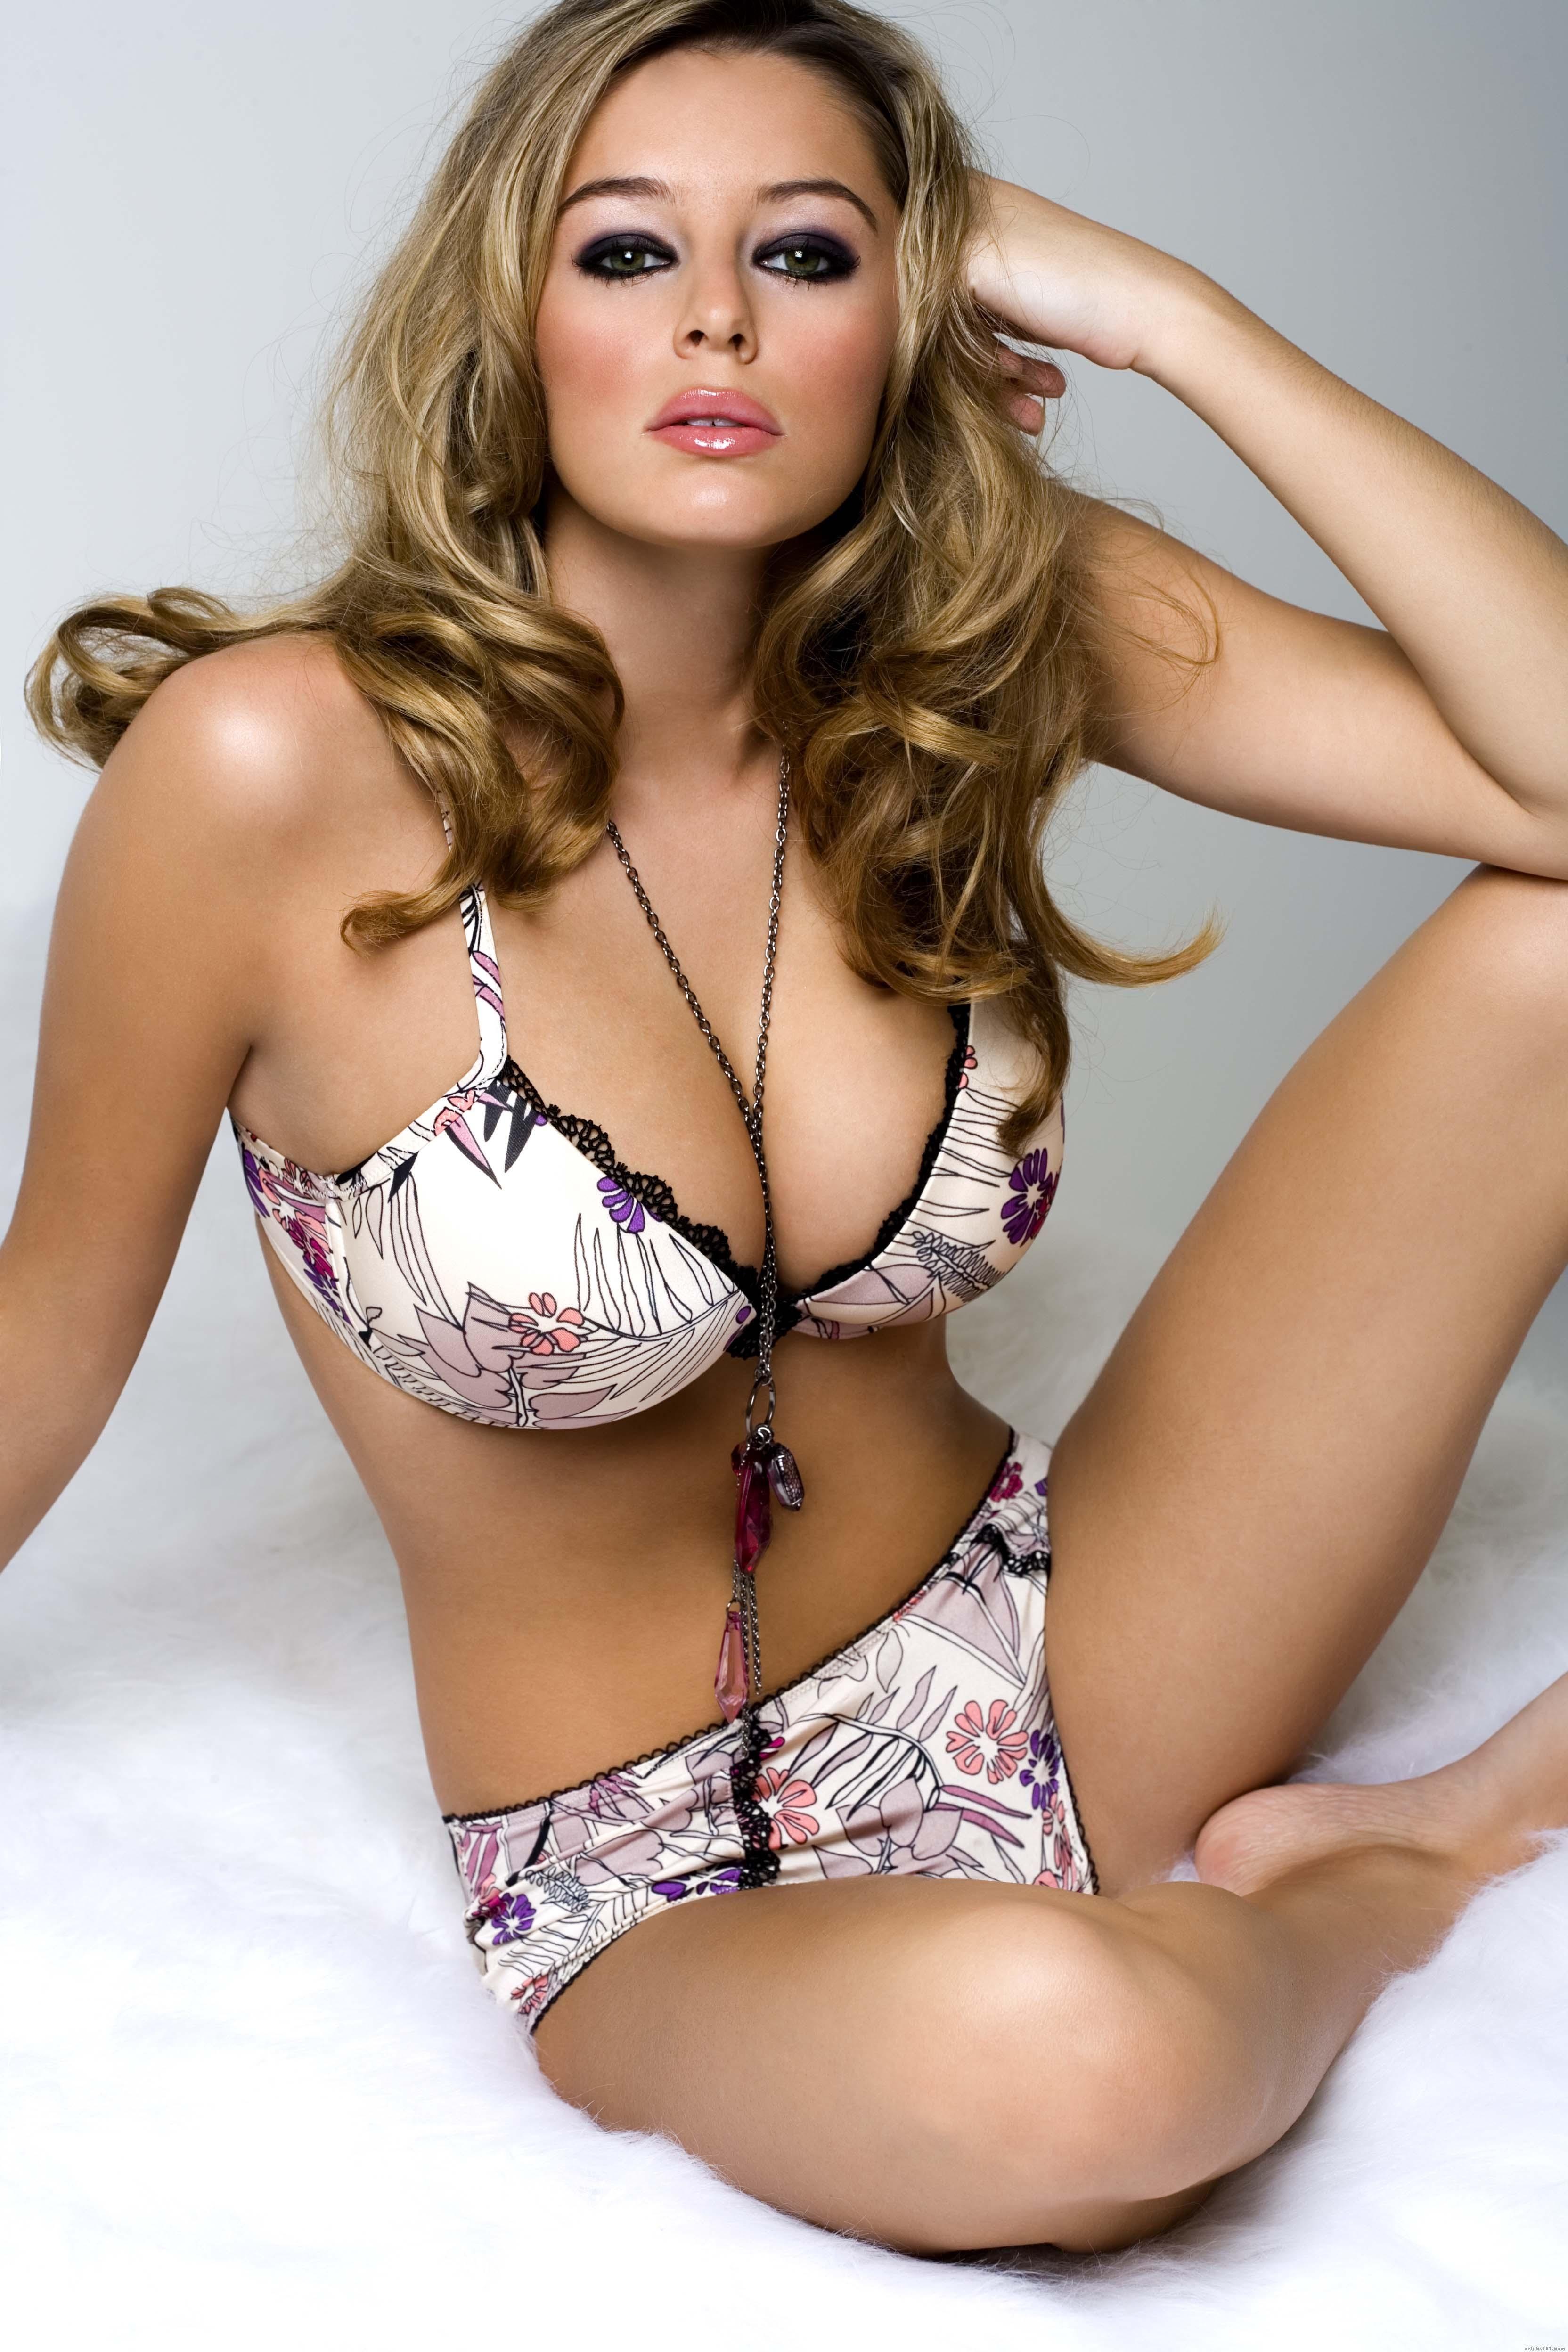 Young Alicia Machado nudes (44 photos), Pussy, Bikini, Feet, braless 2020